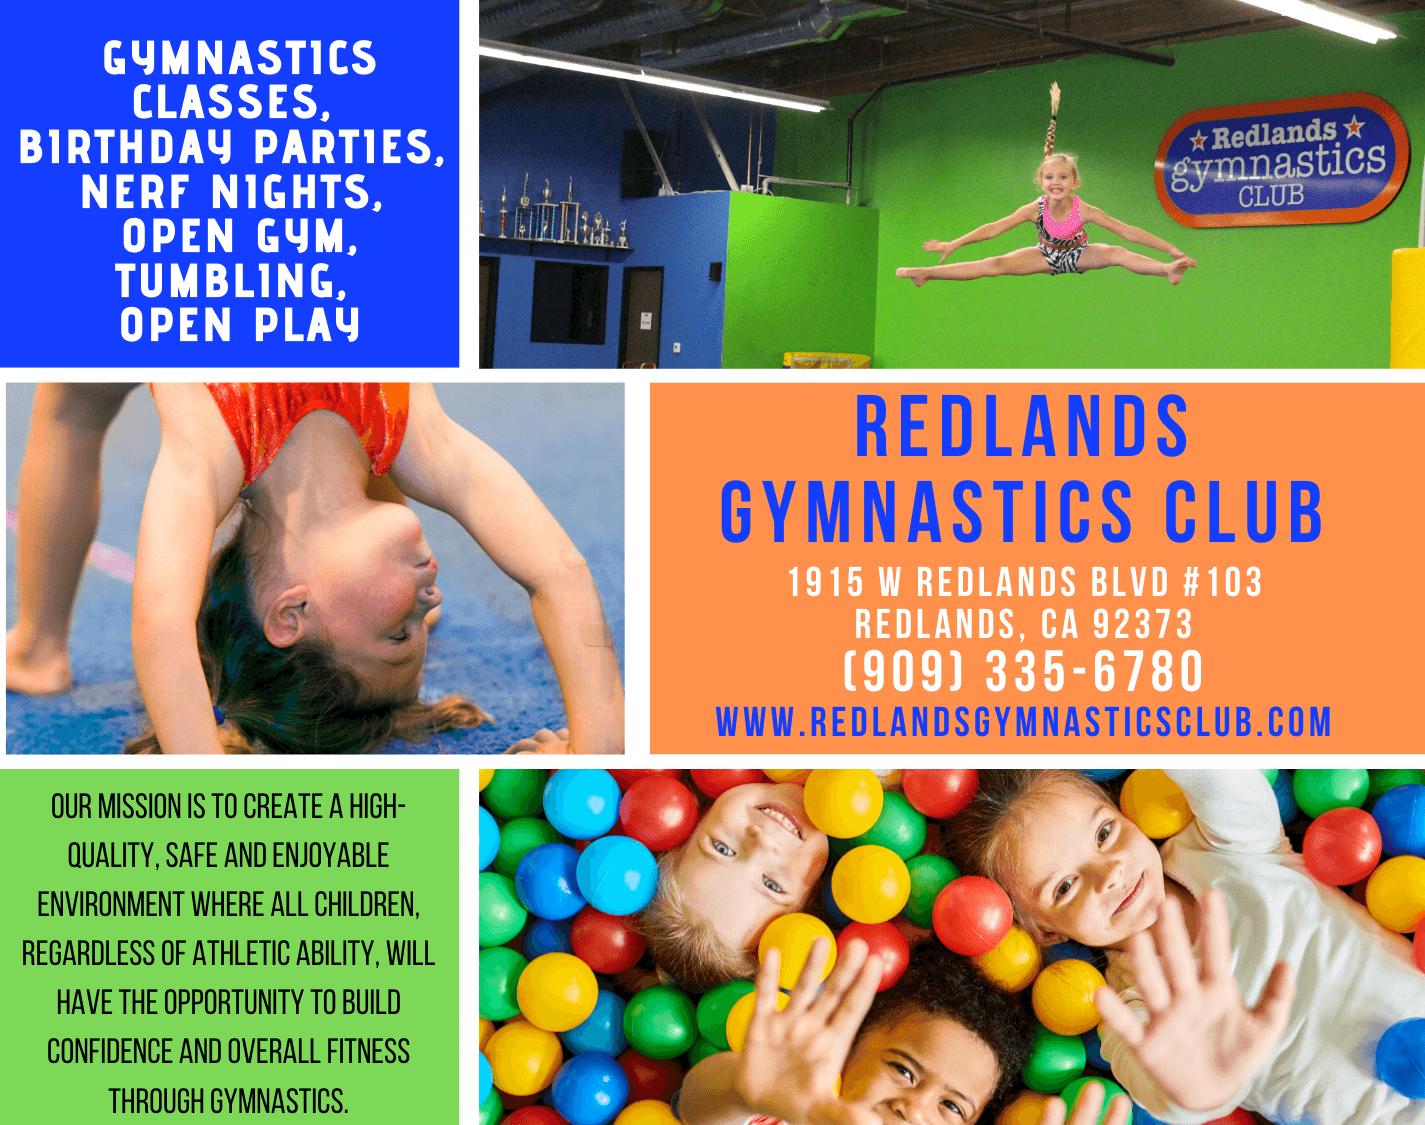 Redlands Gymnastics Club